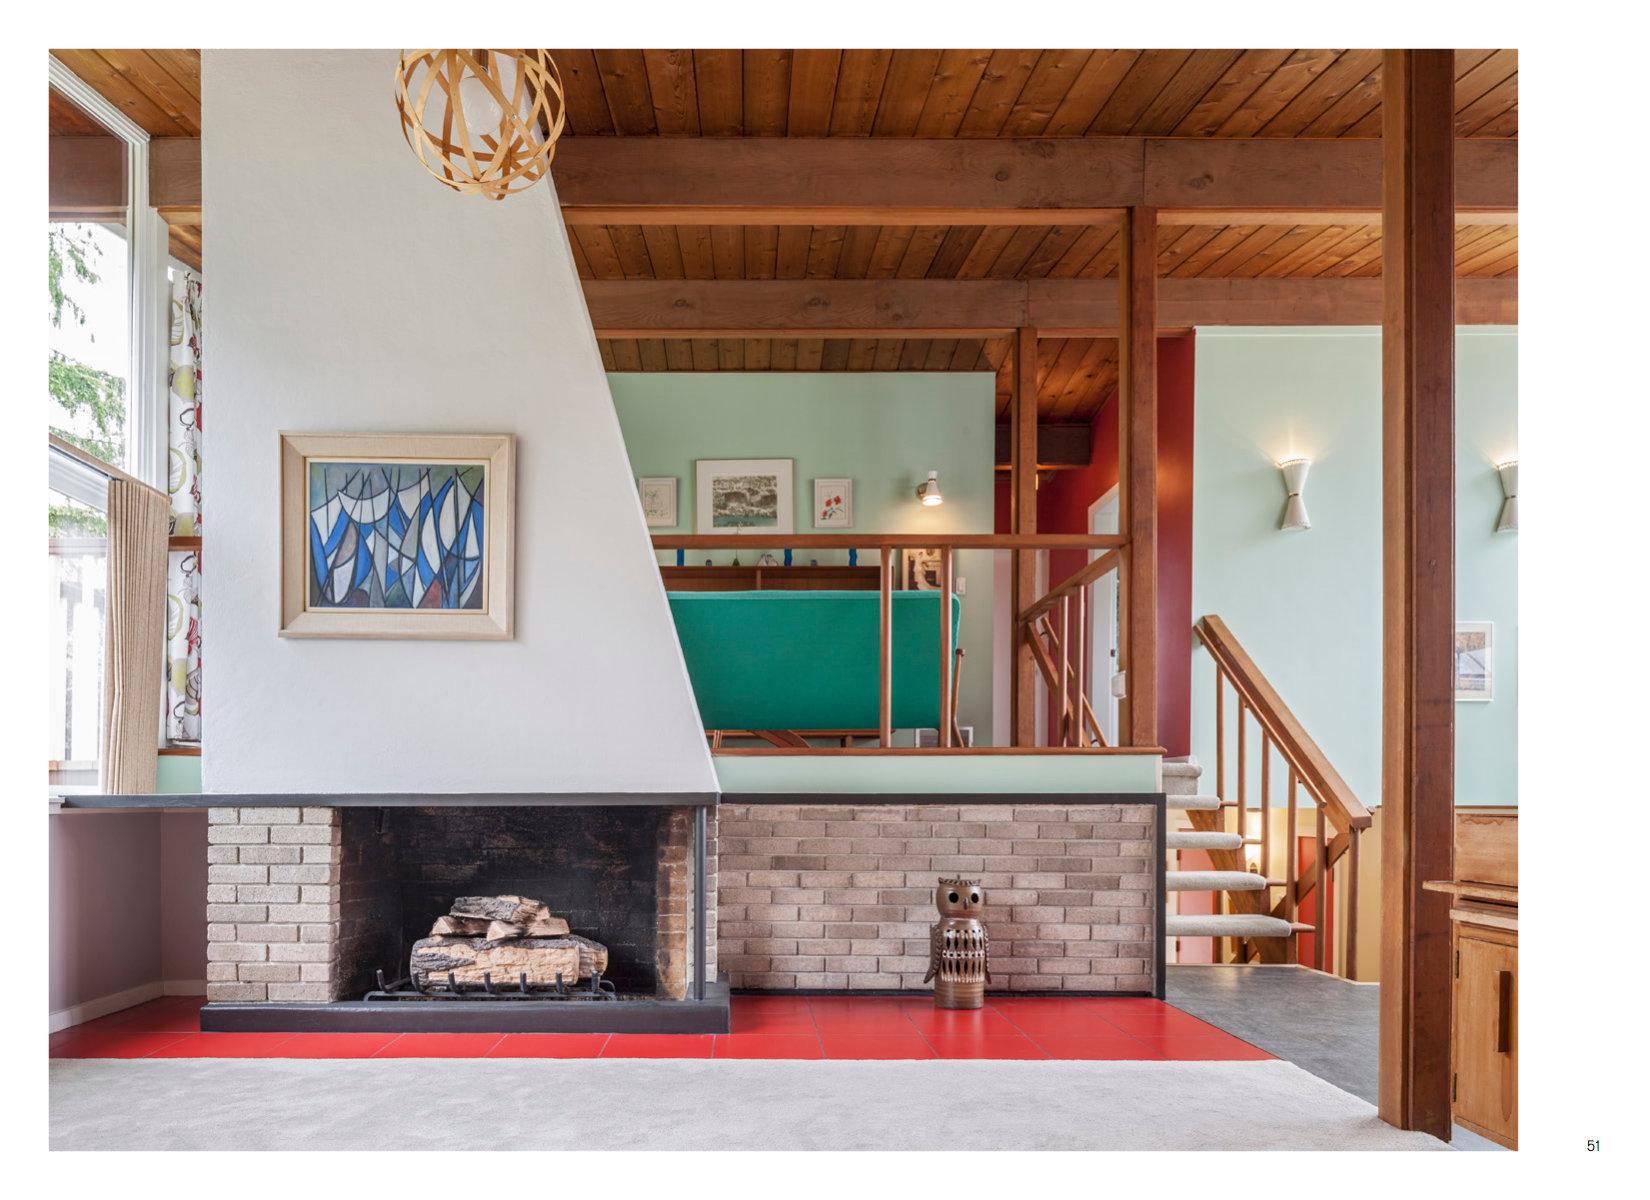 50-51 Friedman House.jpg